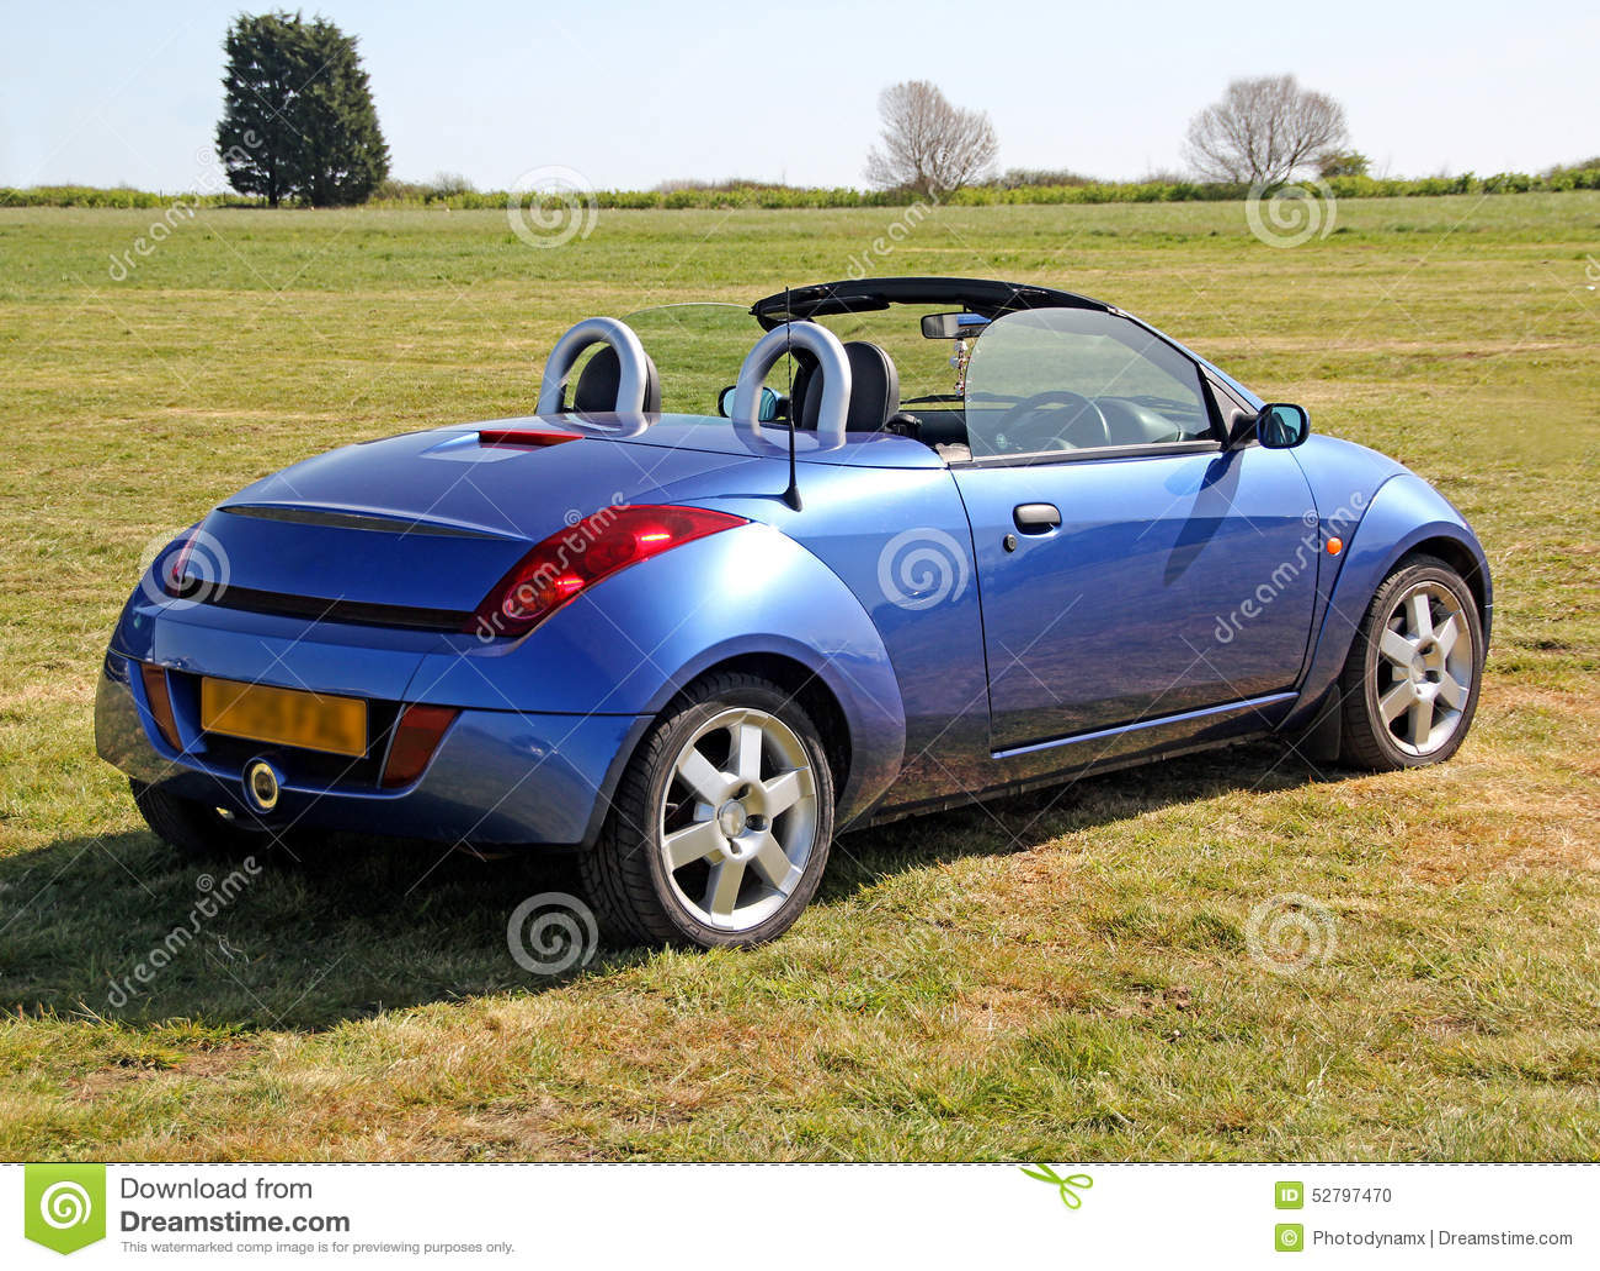 ford ka convertible car stock photo image of transport 52797470. Black Bedroom Furniture Sets. Home Design Ideas